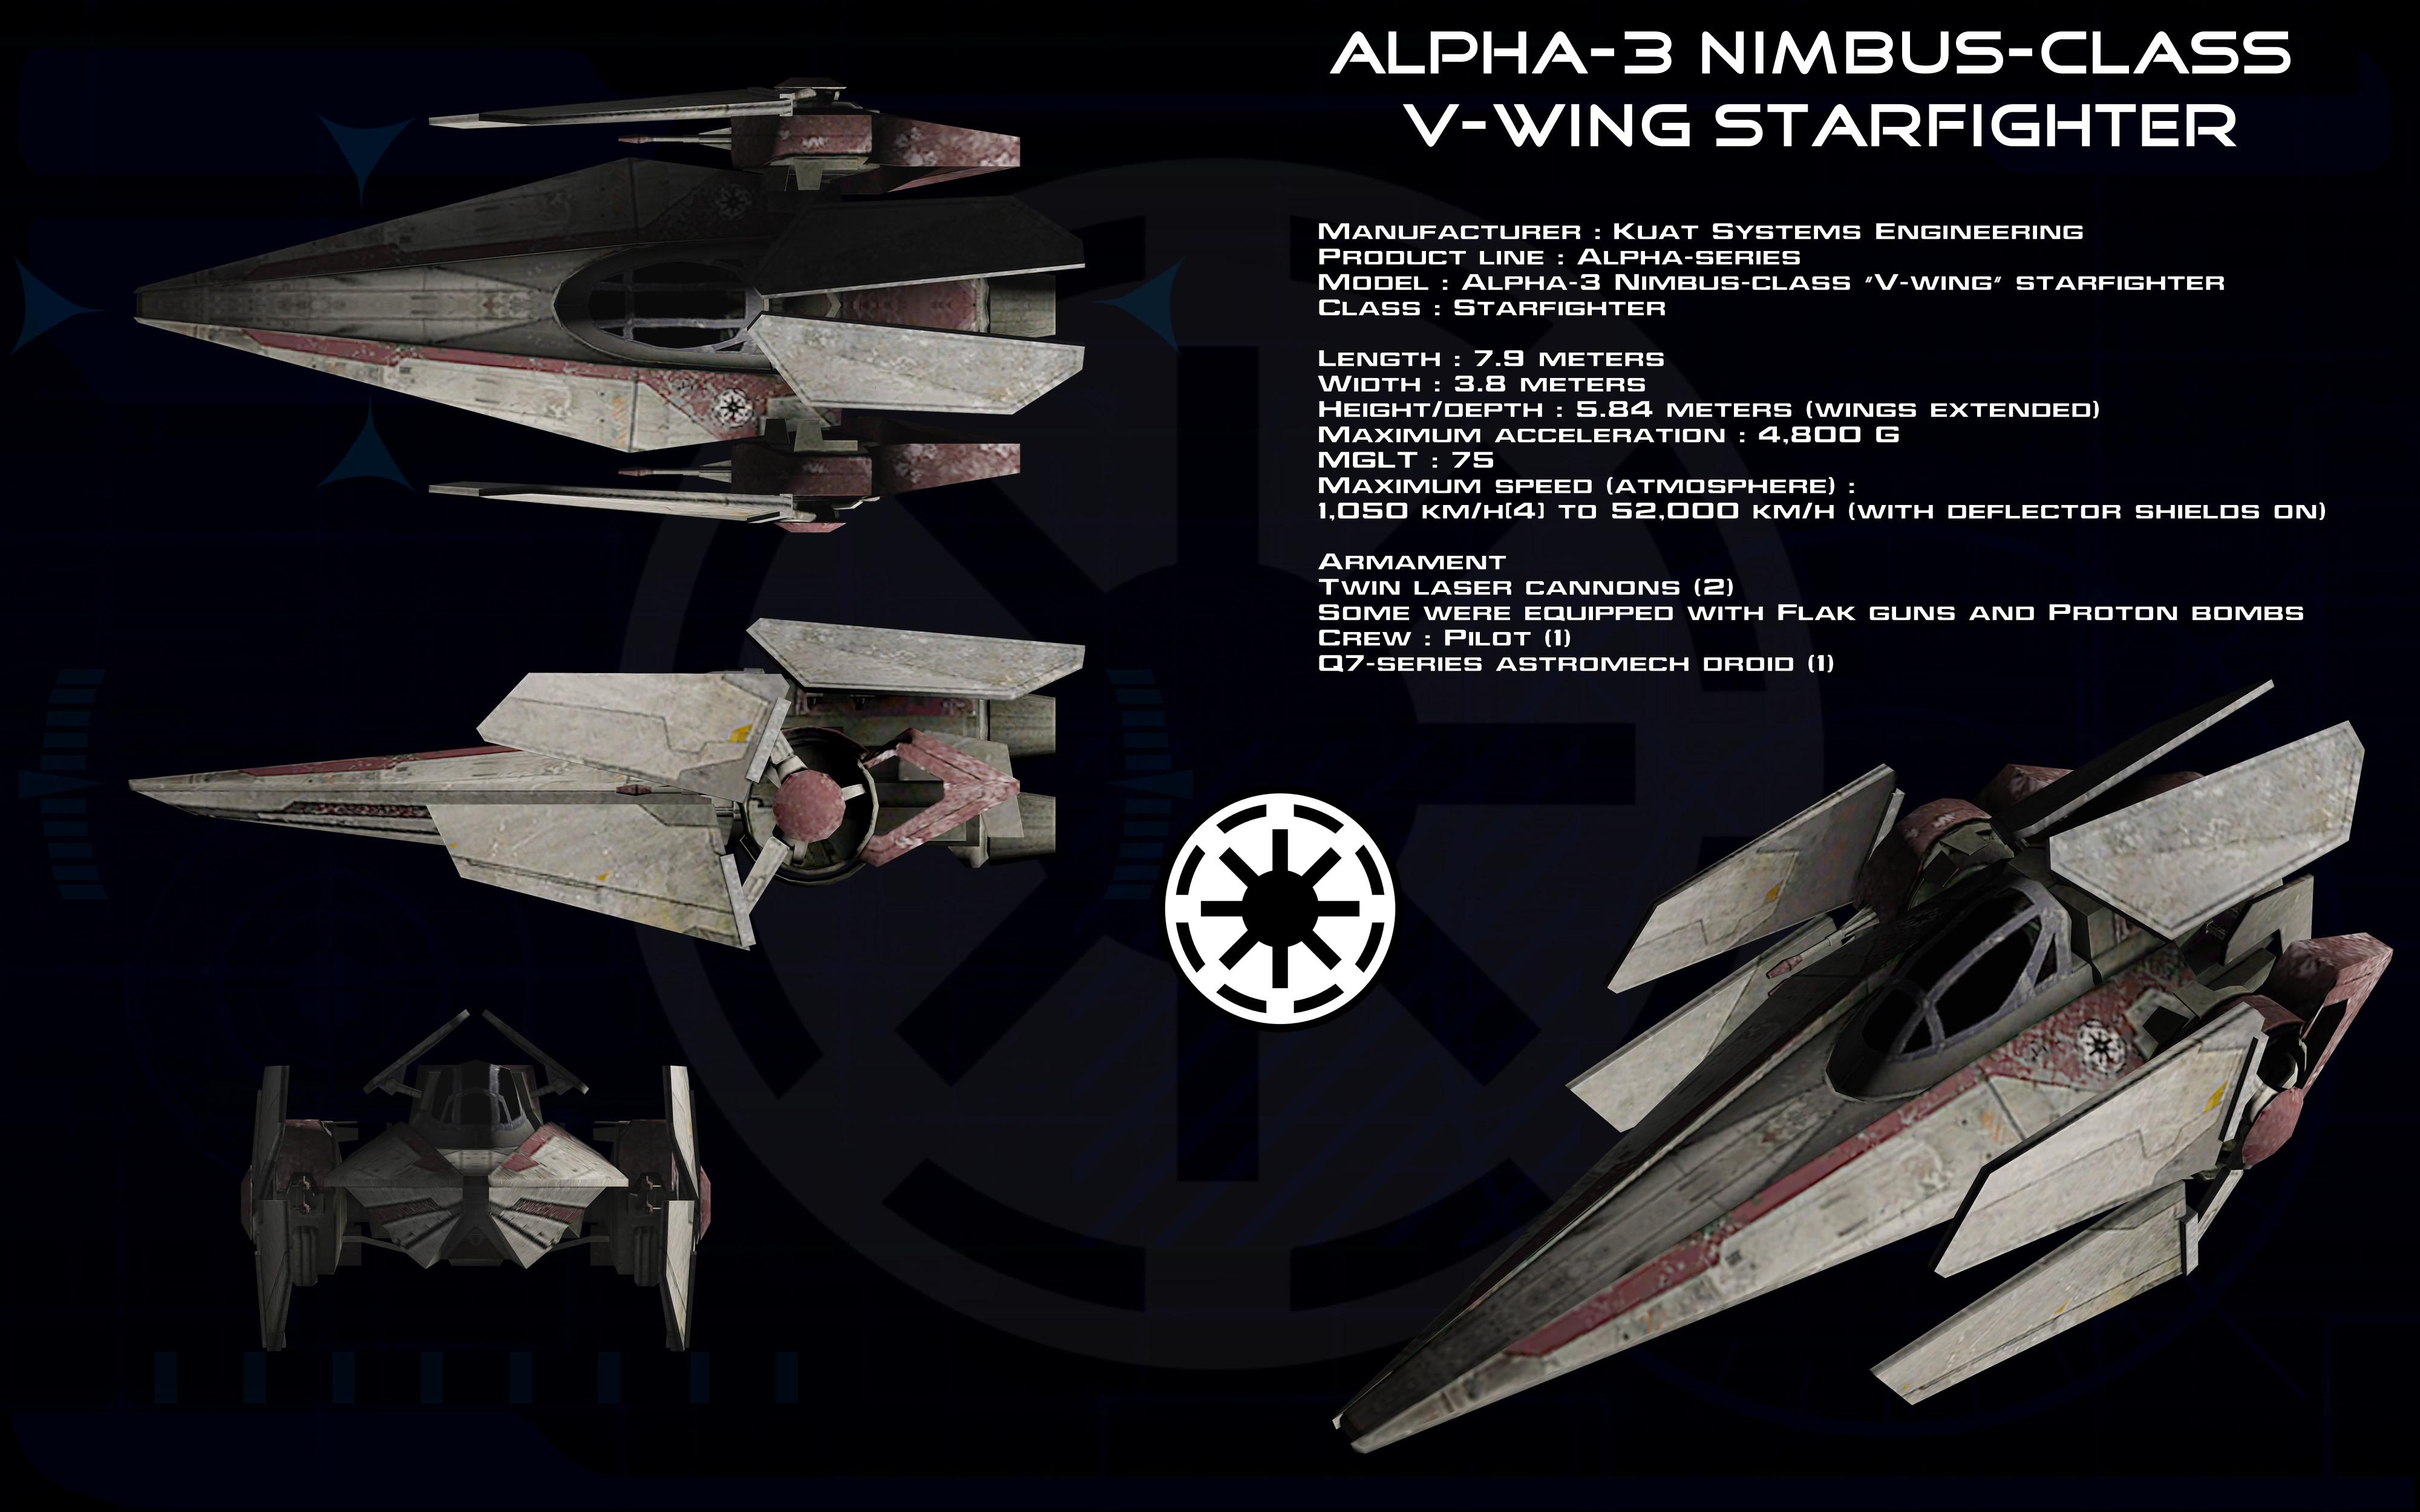 Alpha-3 Nimbus-class V-wing starfighter ortho 1 by unusualsuspex